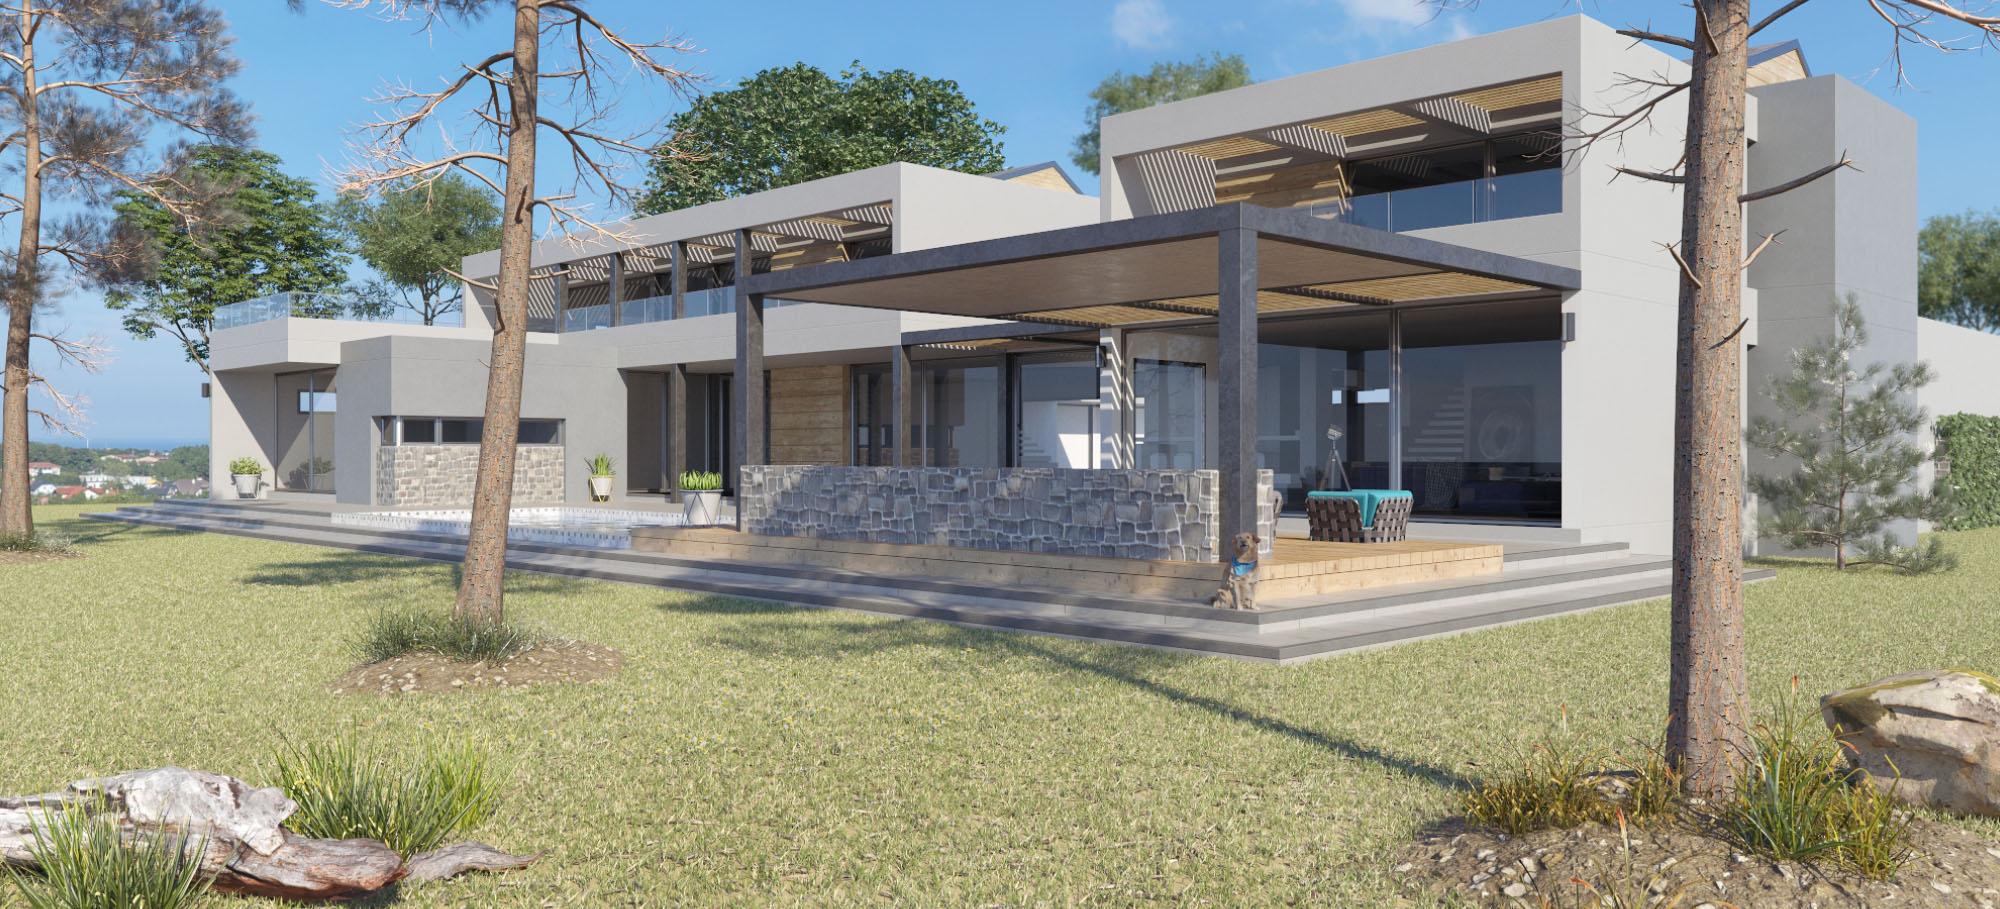 Magersfontein-memorial-property-development-copyrights-www.makespace.co.za.jpg